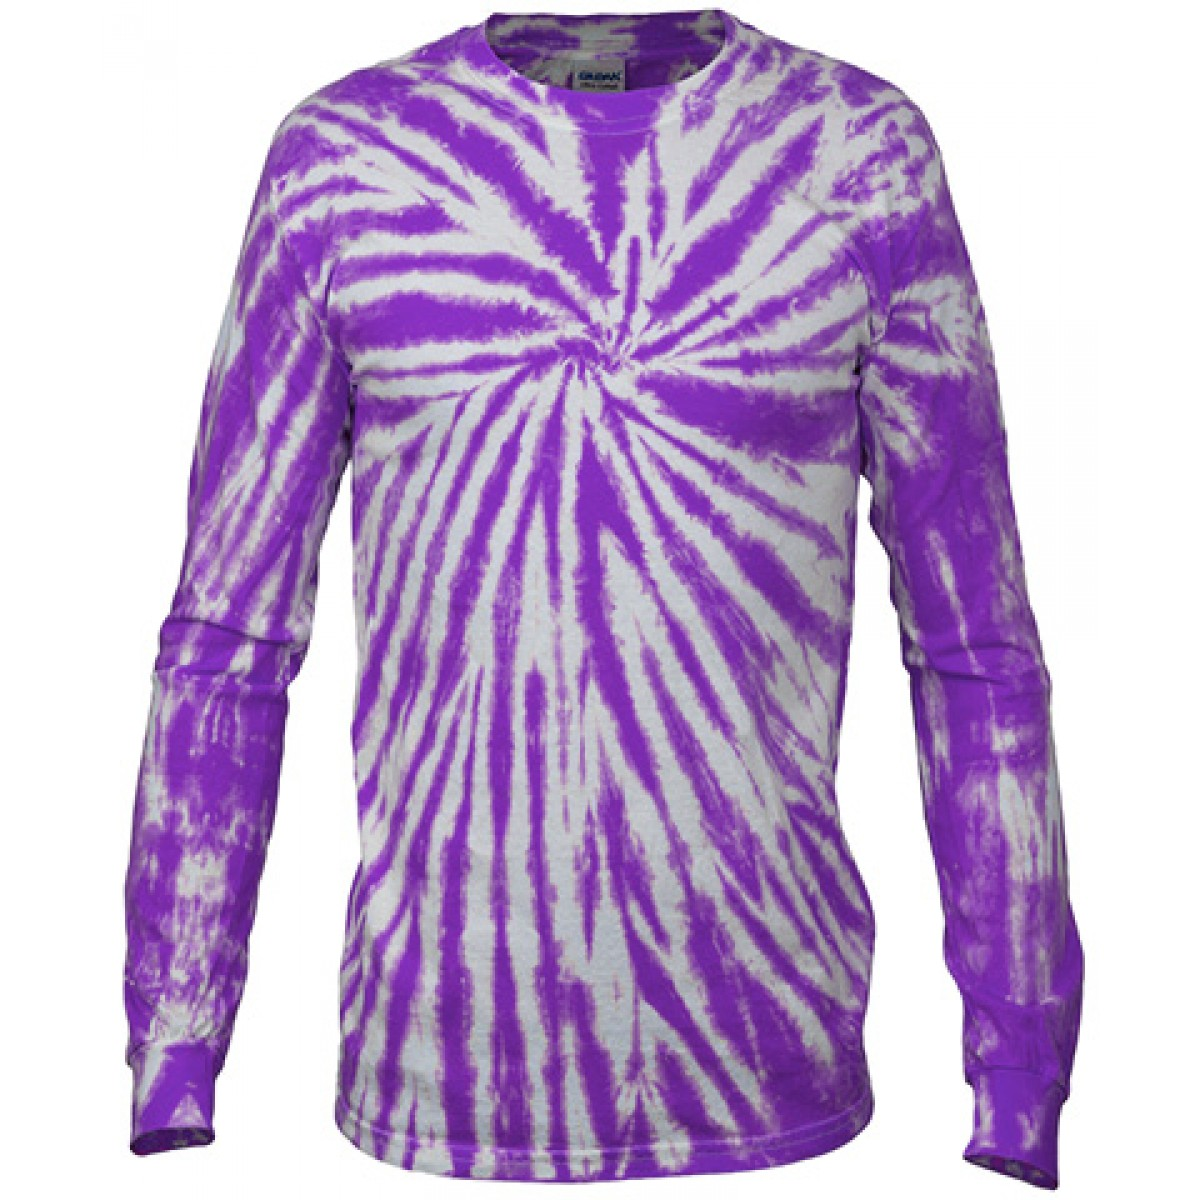 Multi Color Tie-Dye Long Sleeve Shirt -Fuscia-3XL